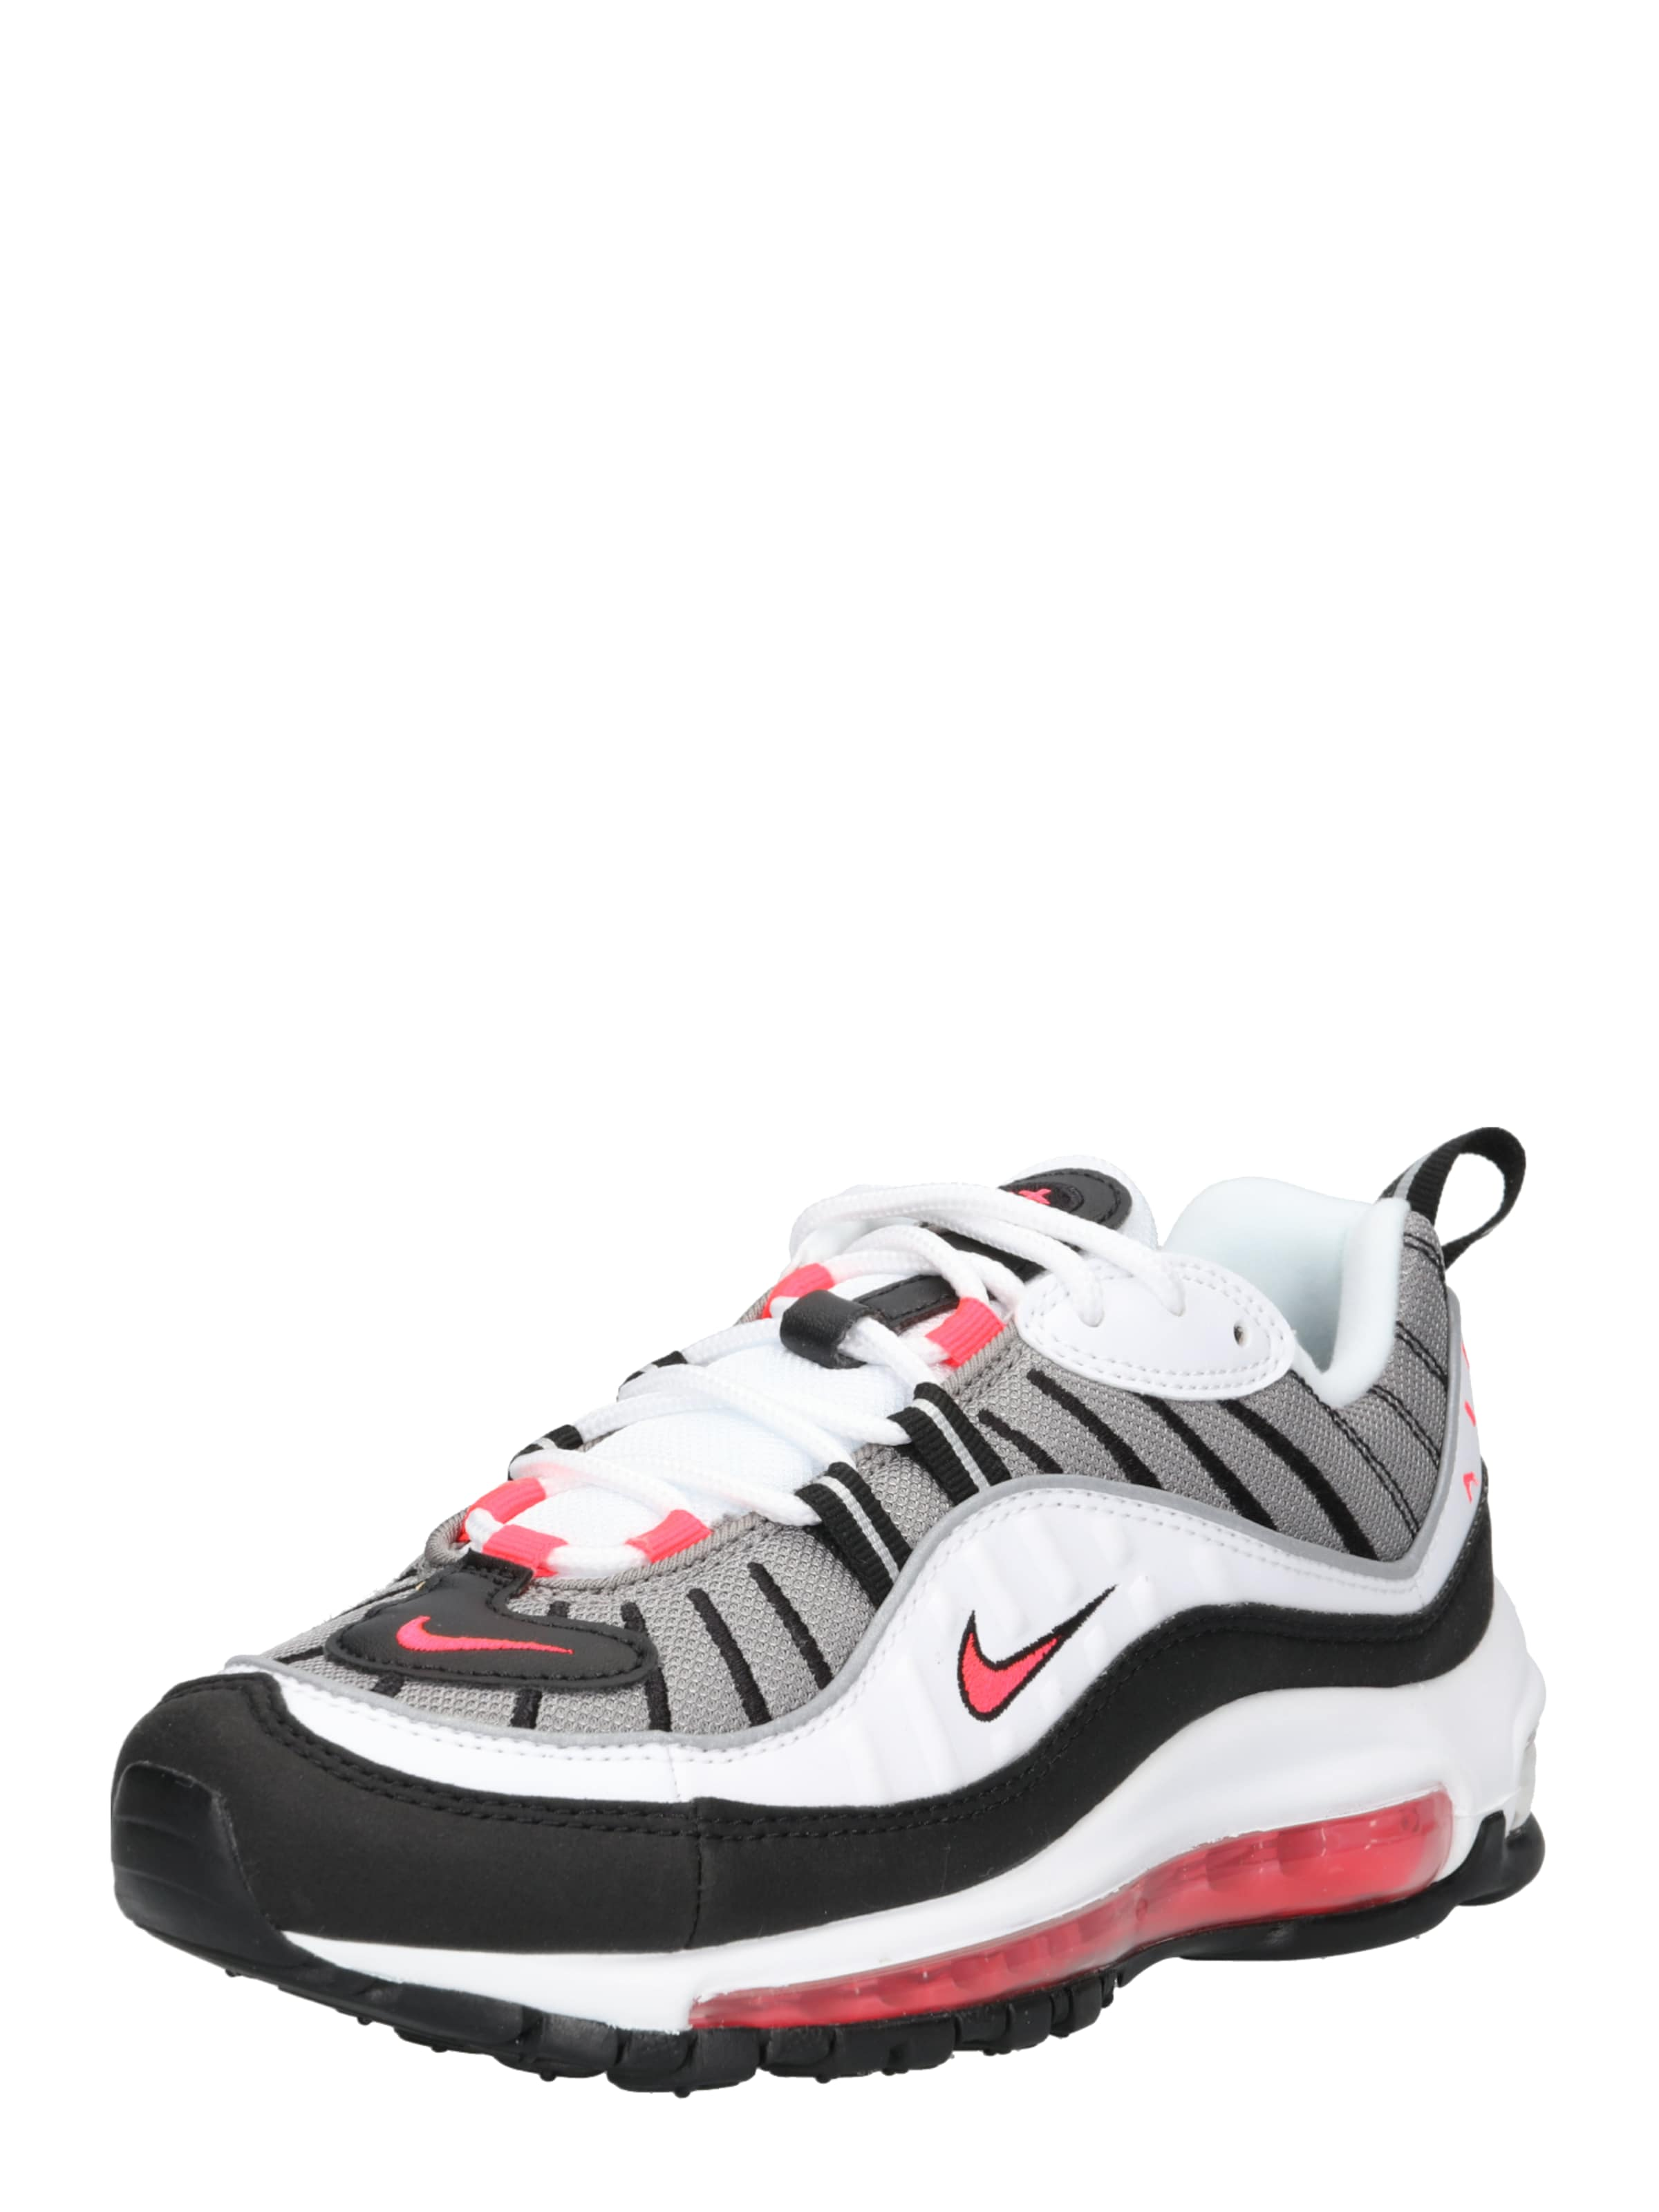 Nike Sportswear Turnschuhe 'Woherren Nike Air Max 98 schuhe' in rot   schwarz   weiß